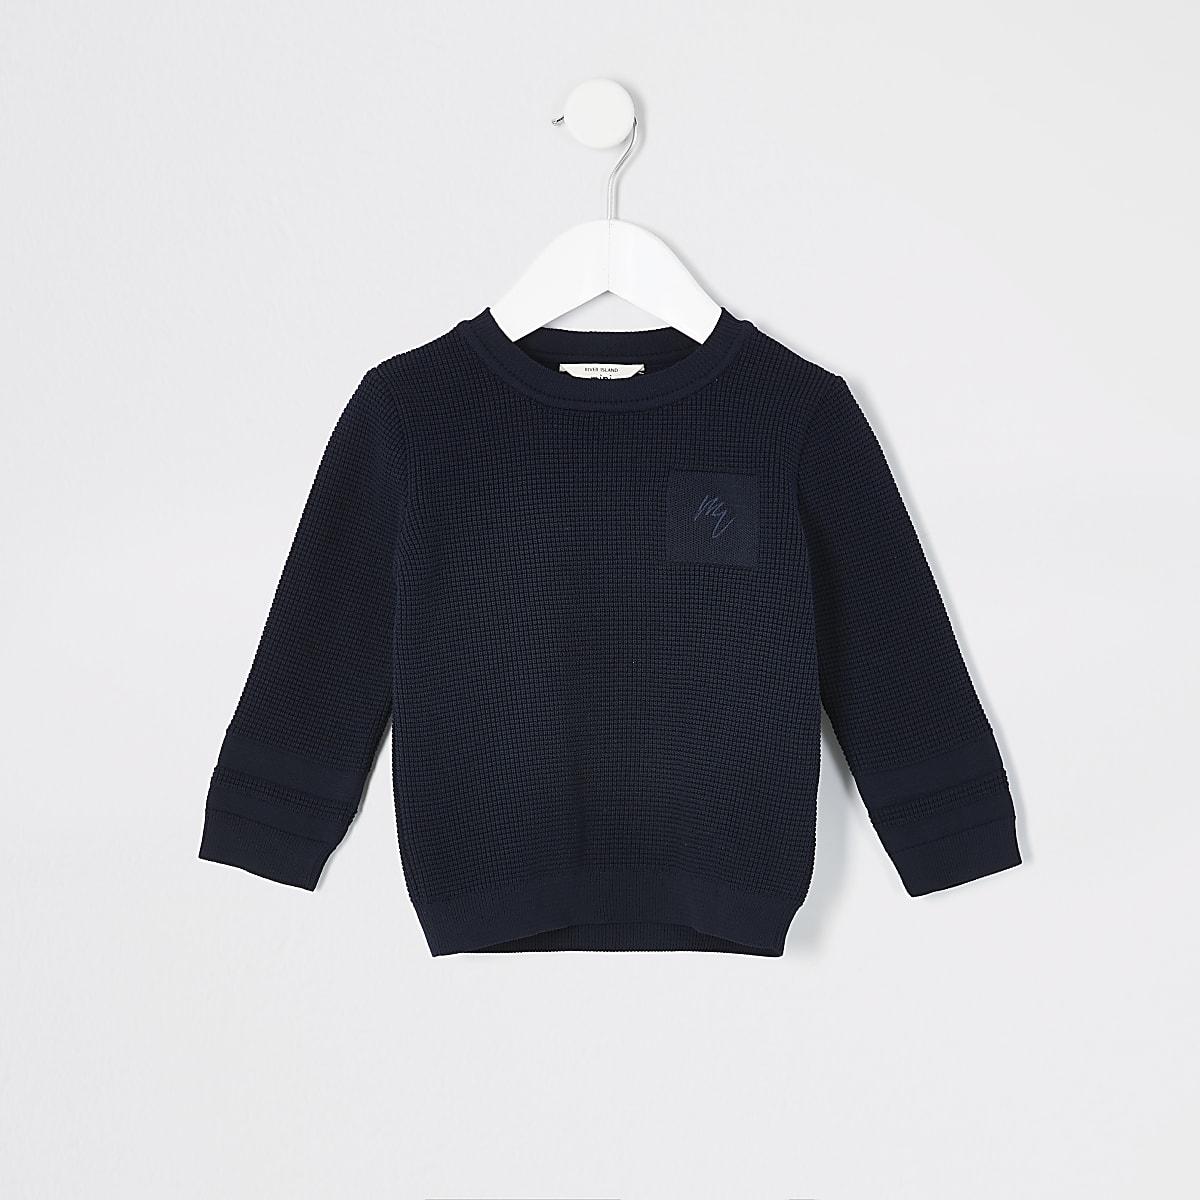 Mini boys navy knitted jumper